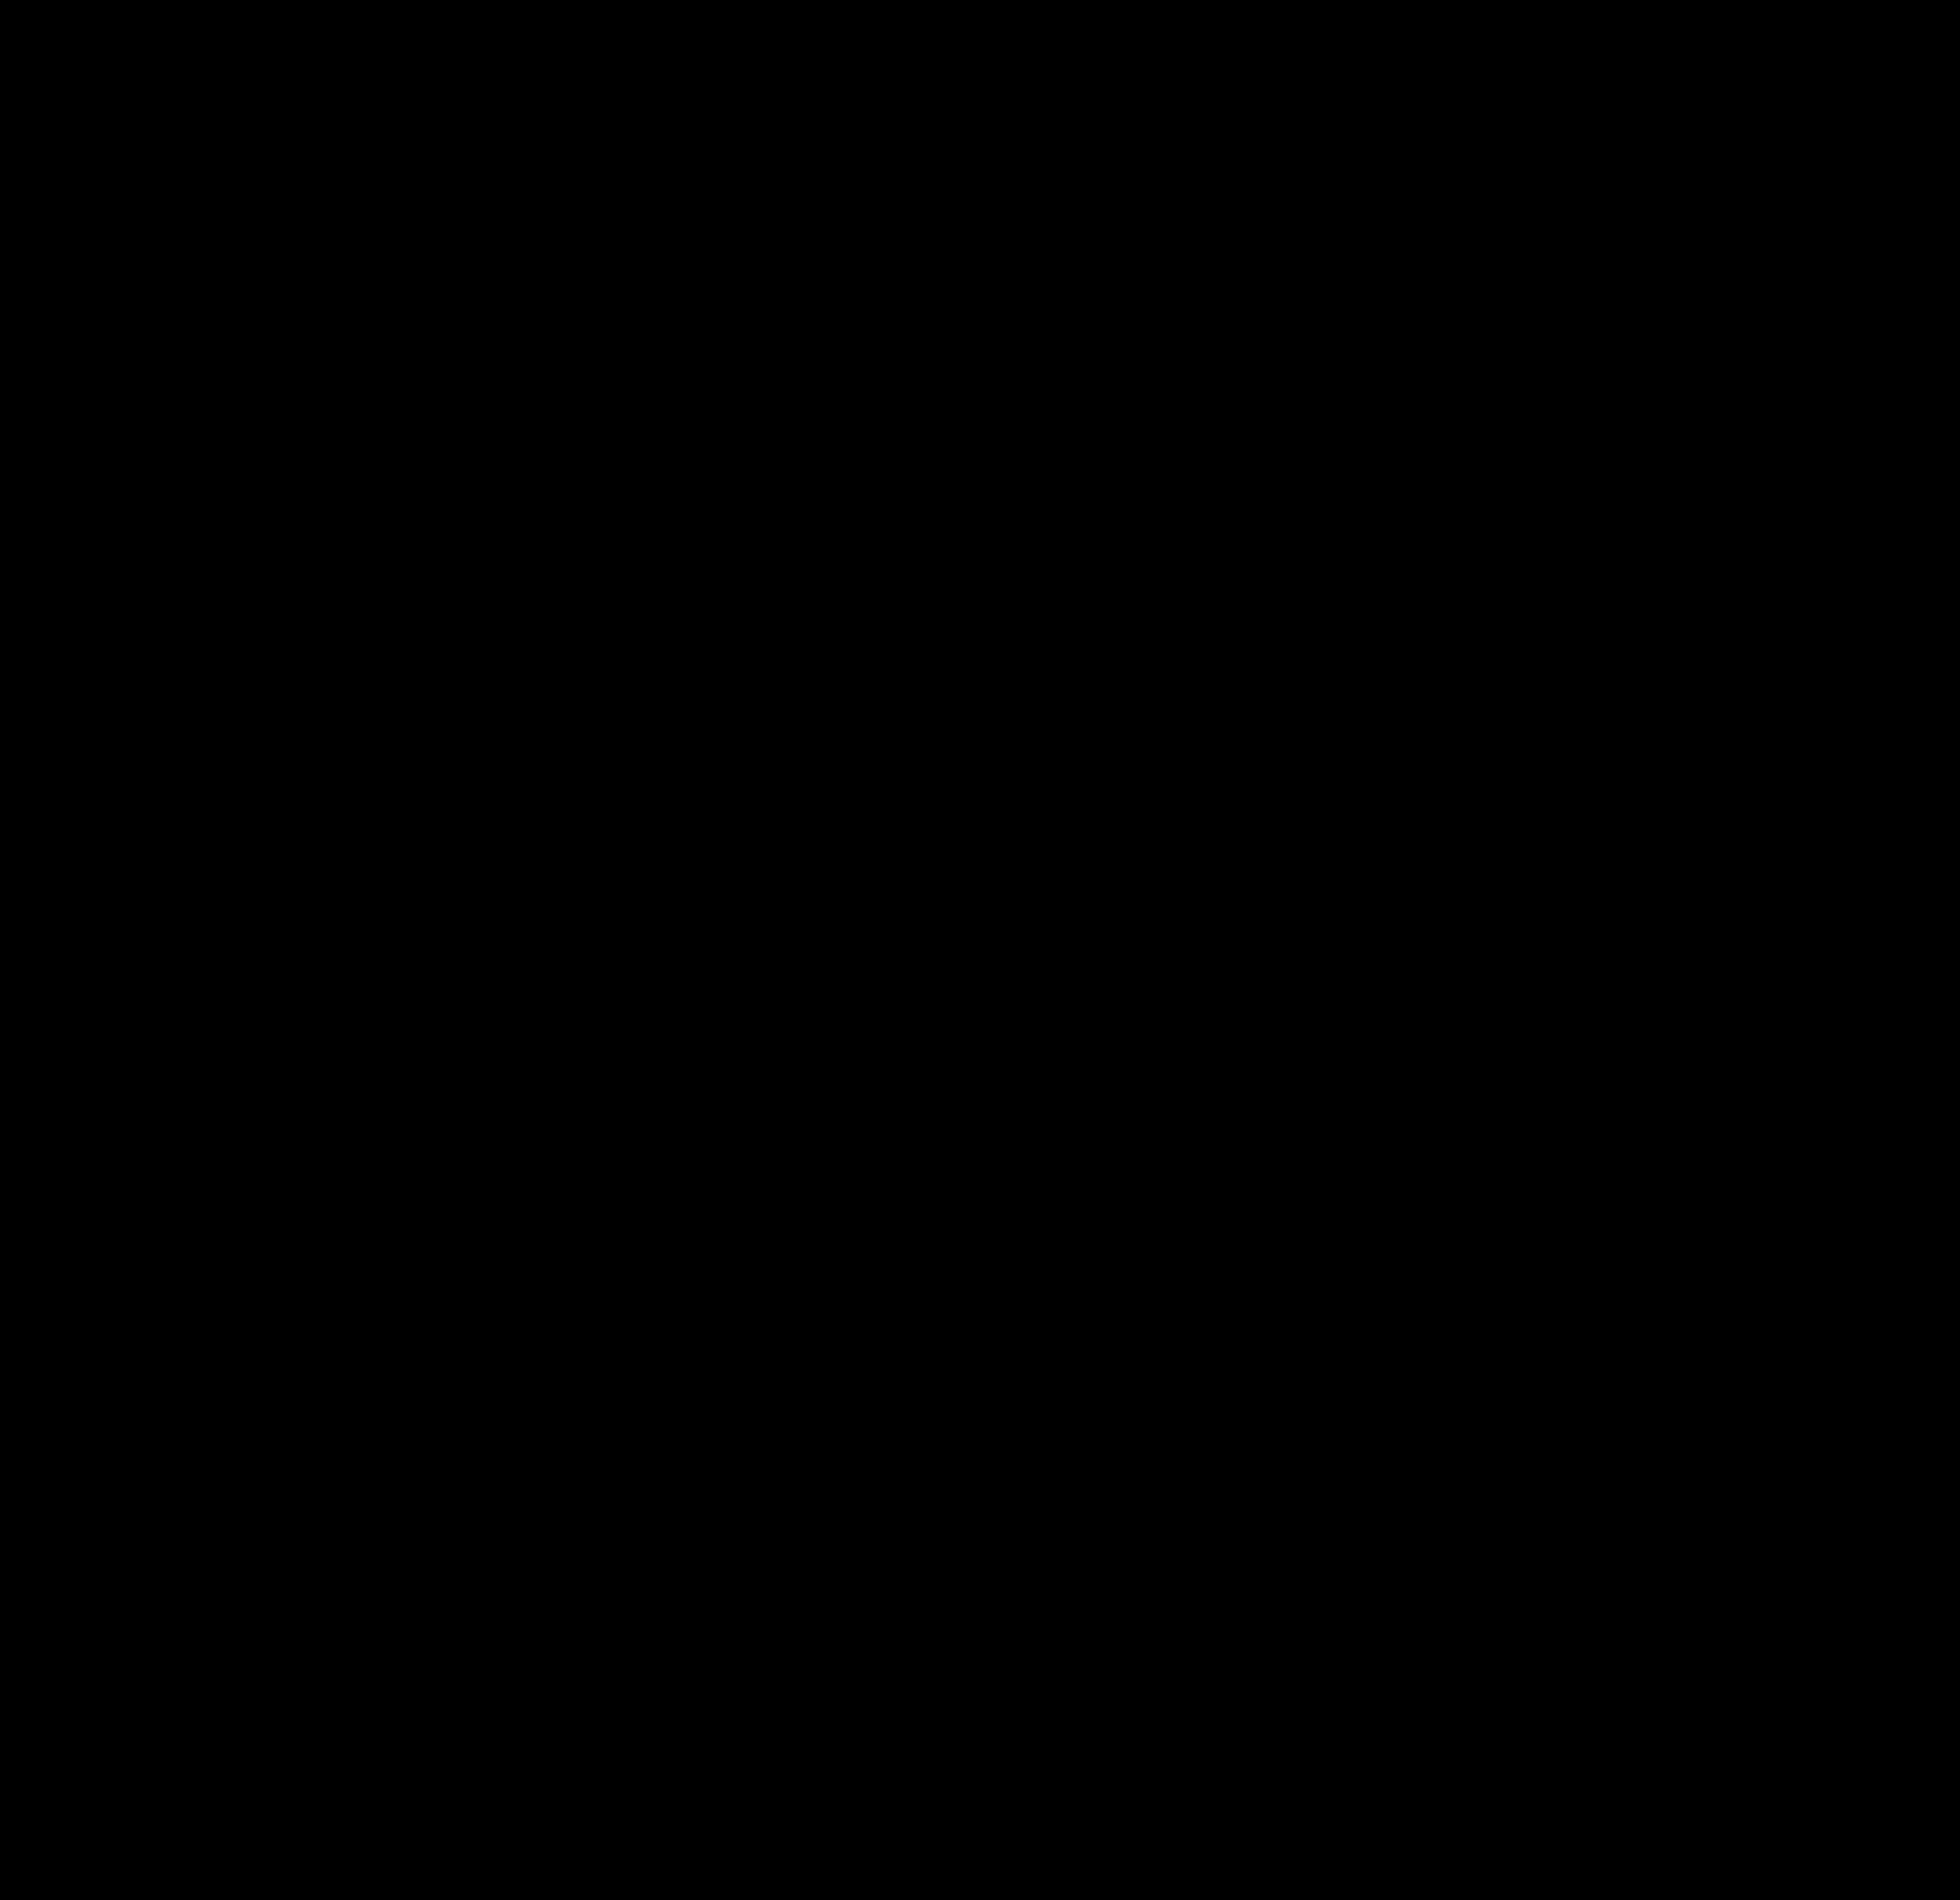 BIG IMAGE (PNG) - Strongman PNG HD